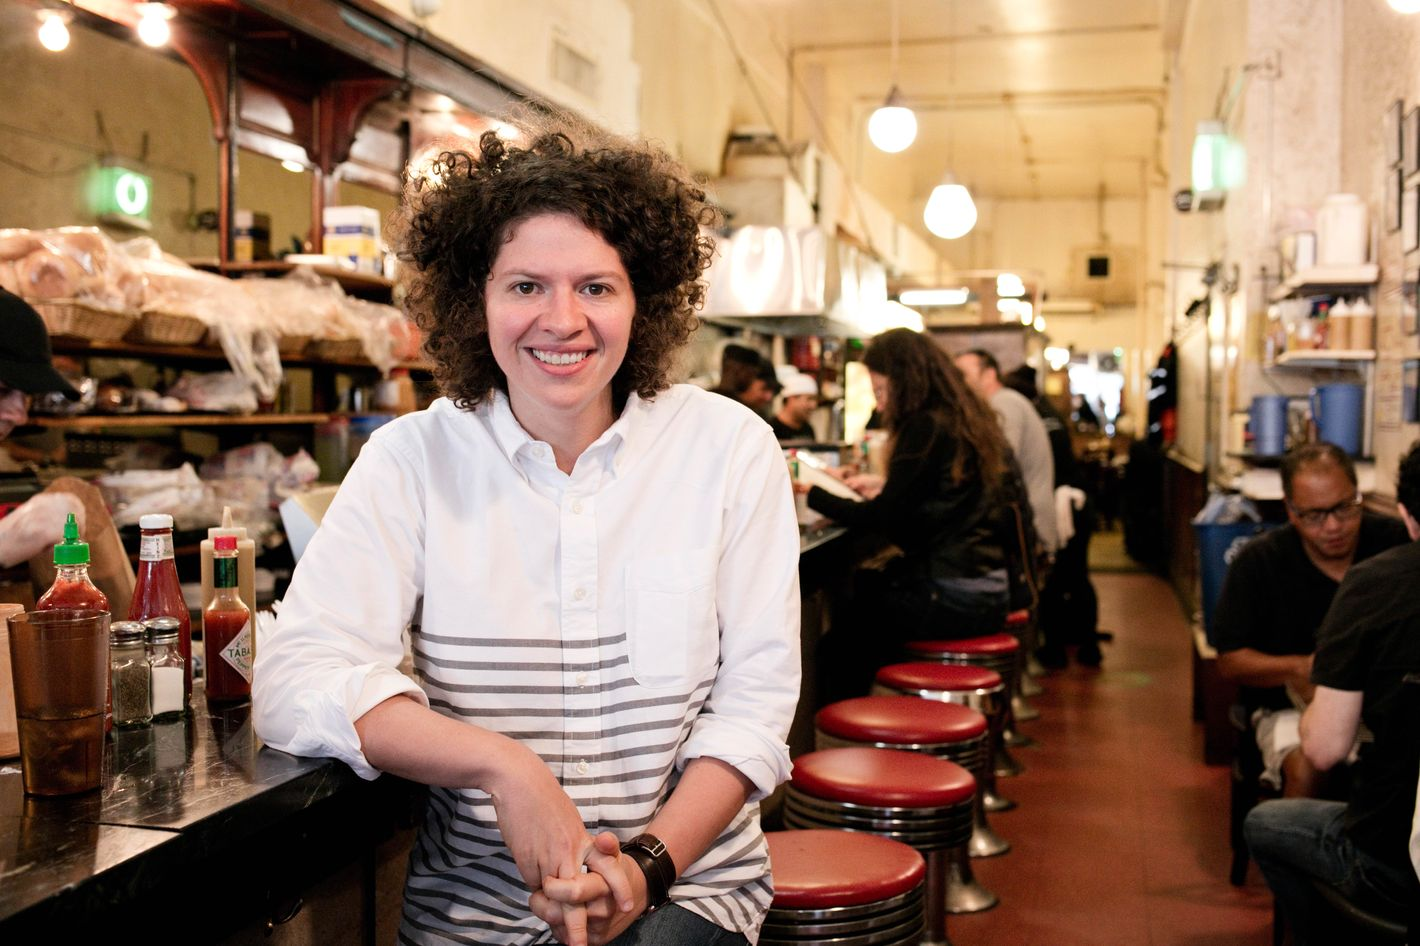 Deb Perelman Husband cookbook author julia turshen's grub street diet